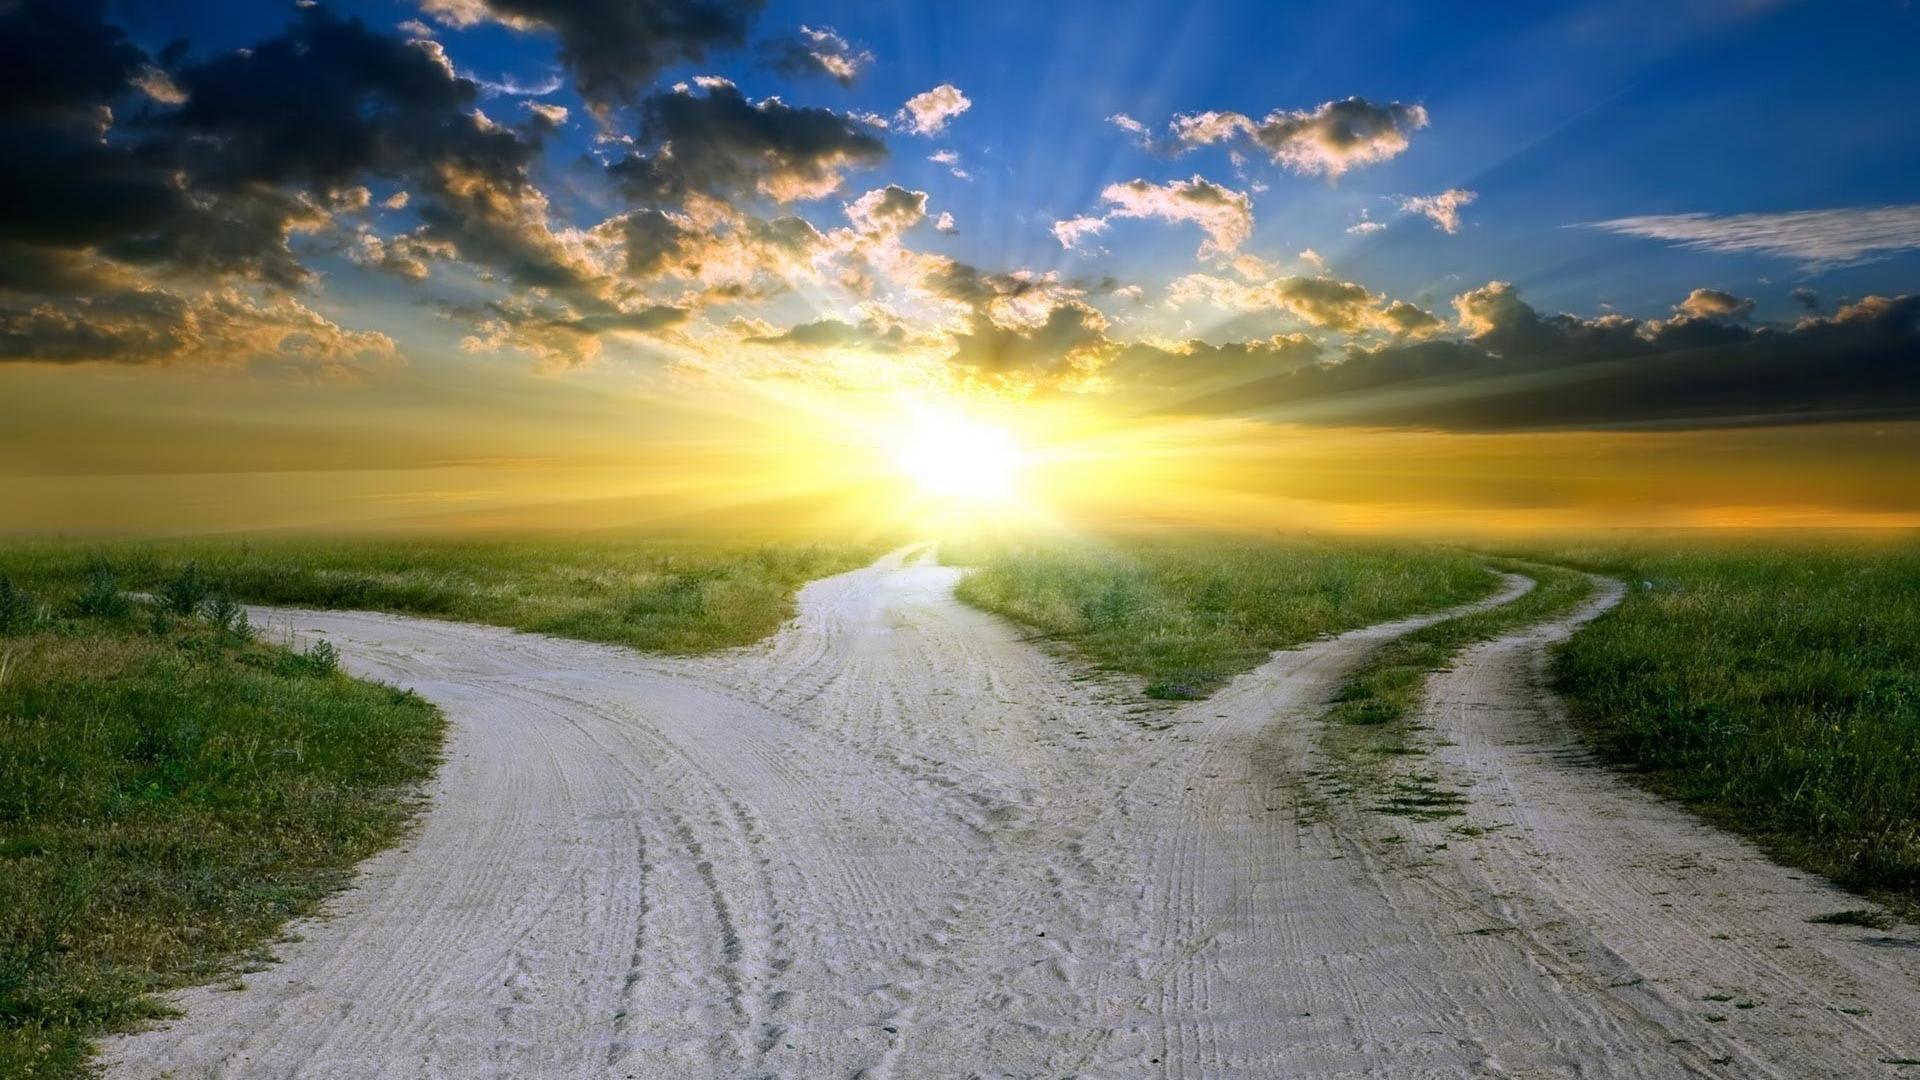 Ezra Taft Benson Chapter 3: Freedom of Choice, an Eternal Principle